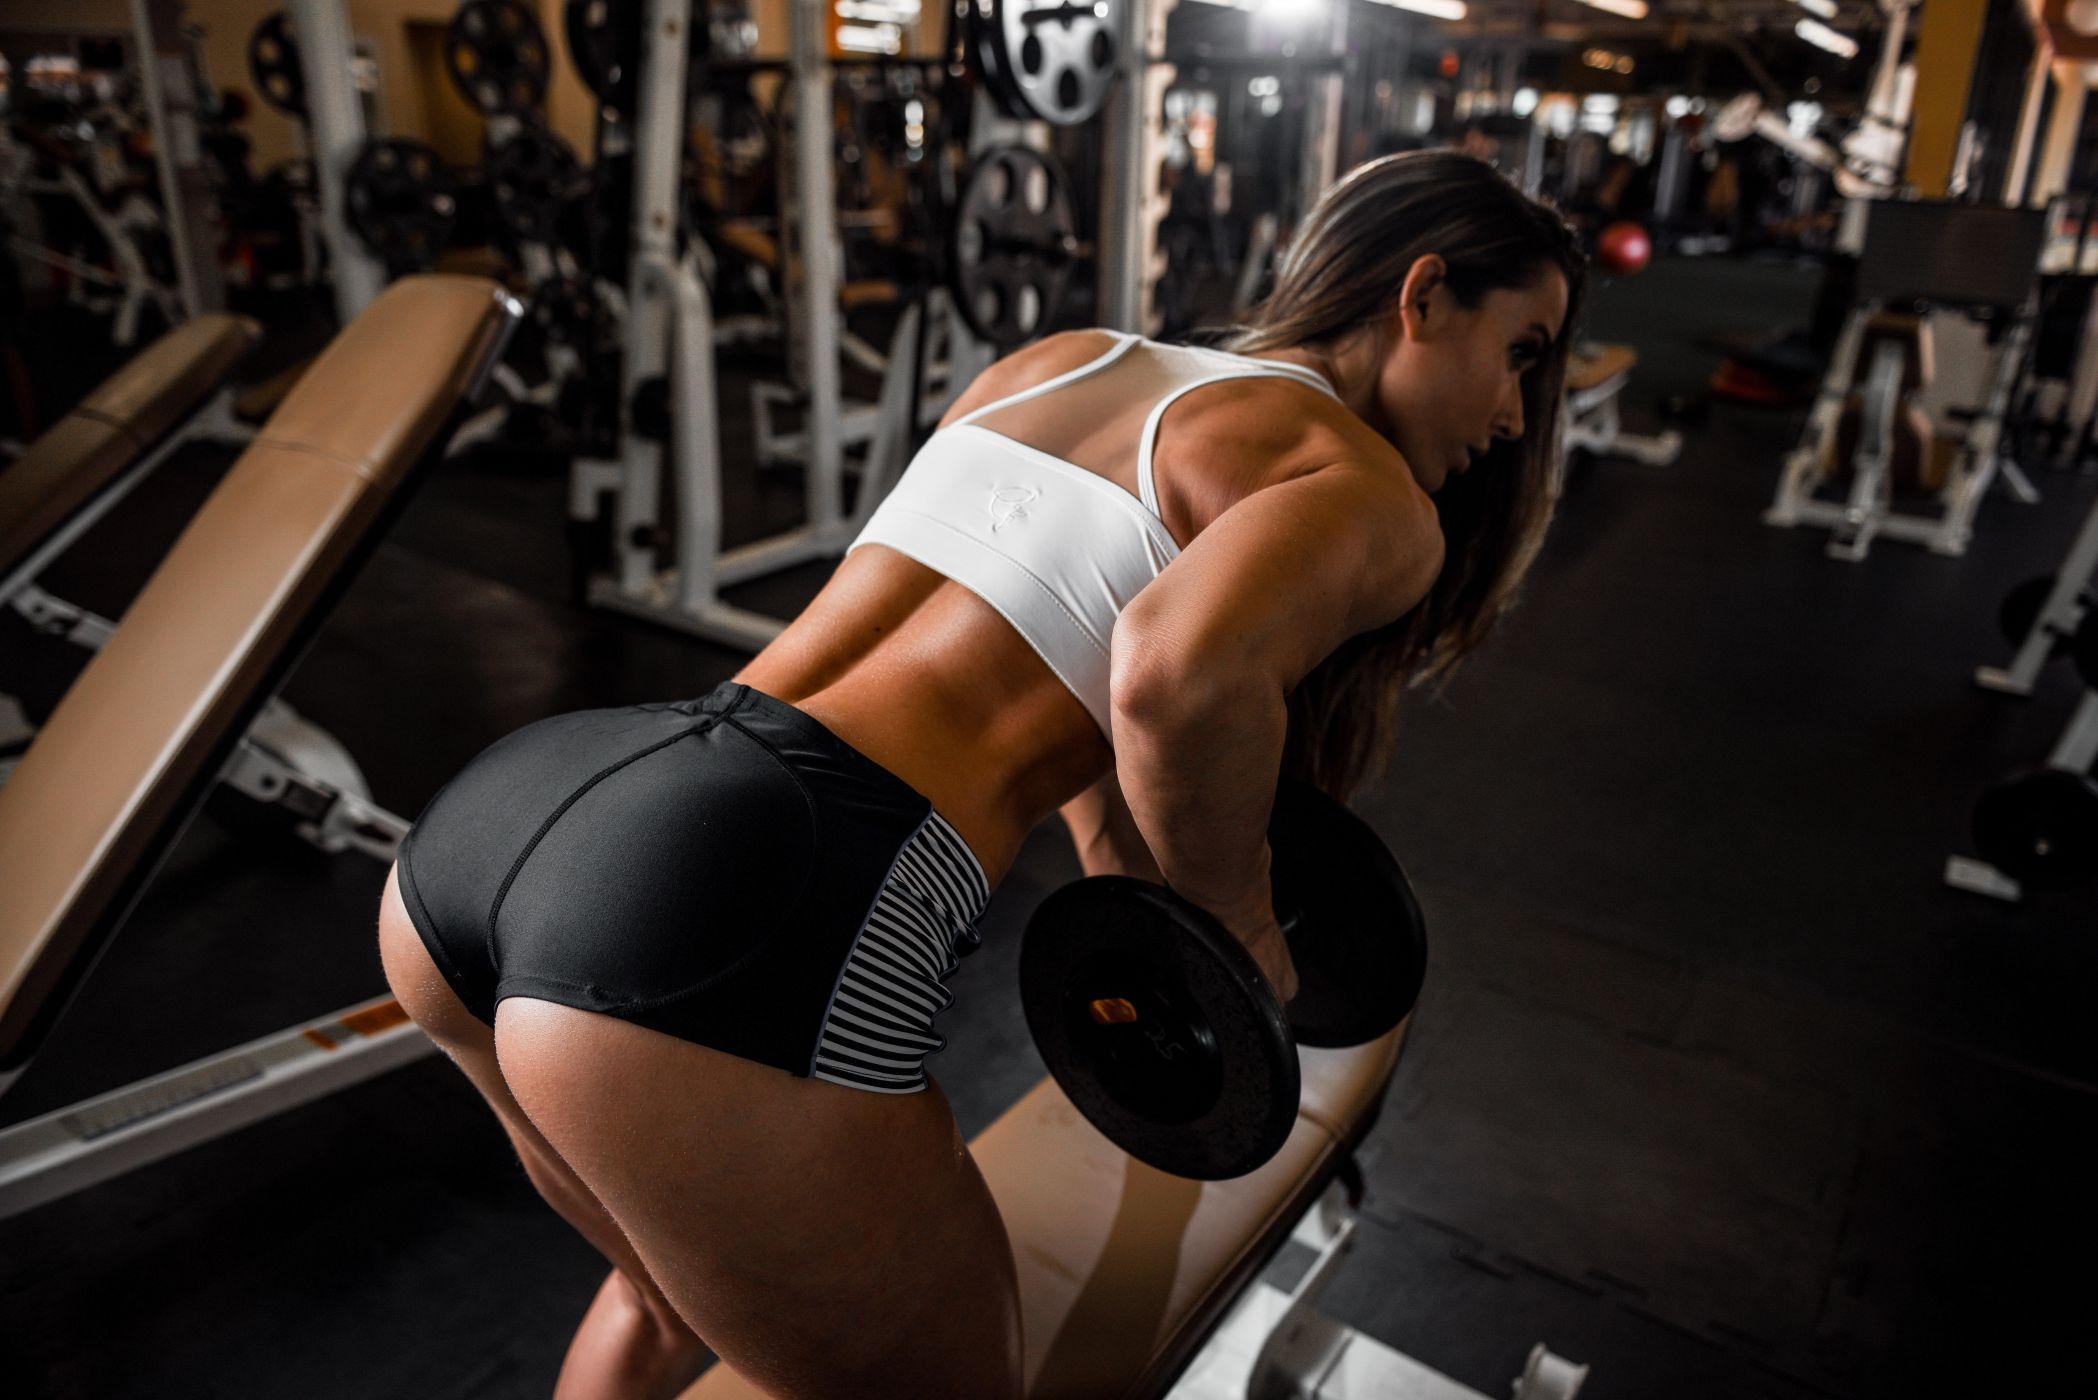 flirty-girl-workout-video-hot-amateur-nude